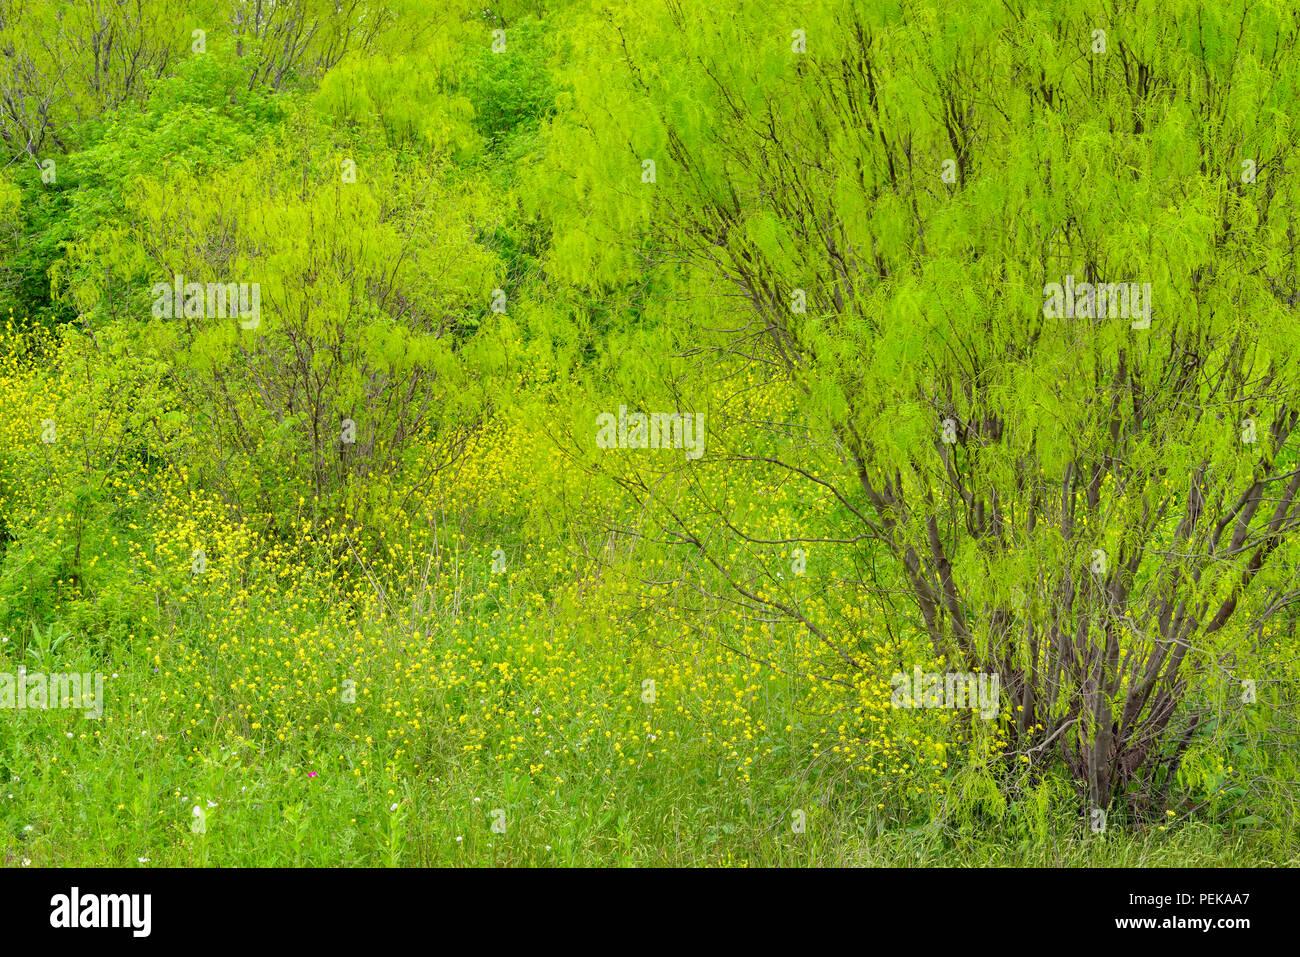 Texas wildflowers in bloom- mustardweed and spring trees, San Antonio, Texas, USA - Stock Image